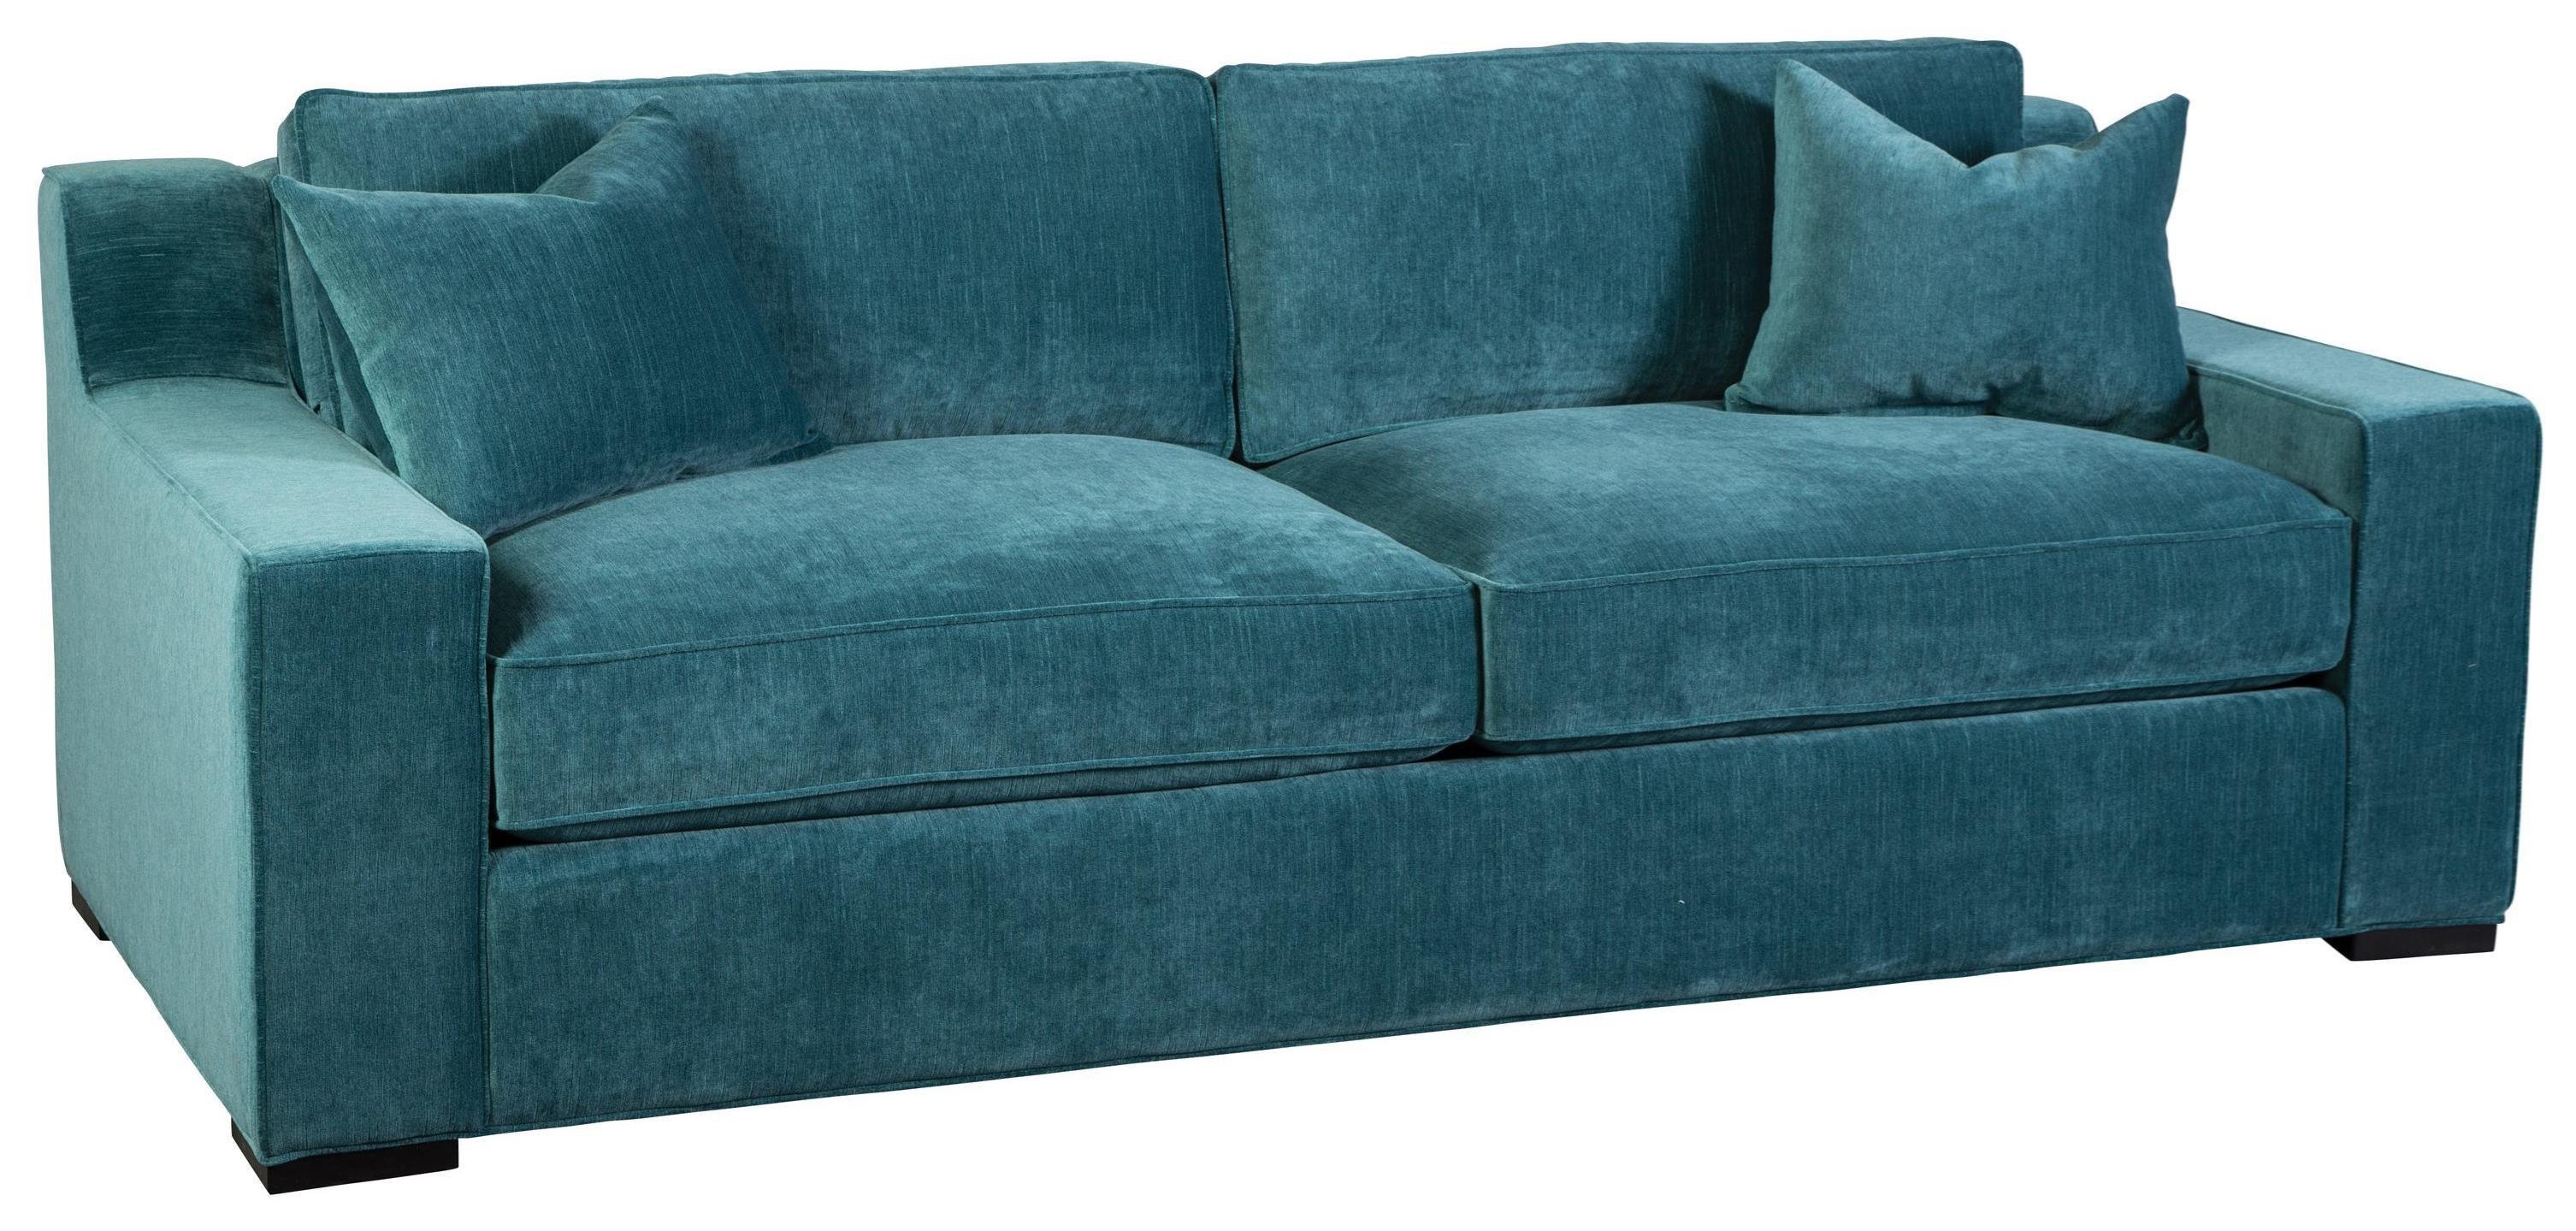 chair covers hamilton ontario hair salon chairs jonathan louis morello sofa stoney creek furniture